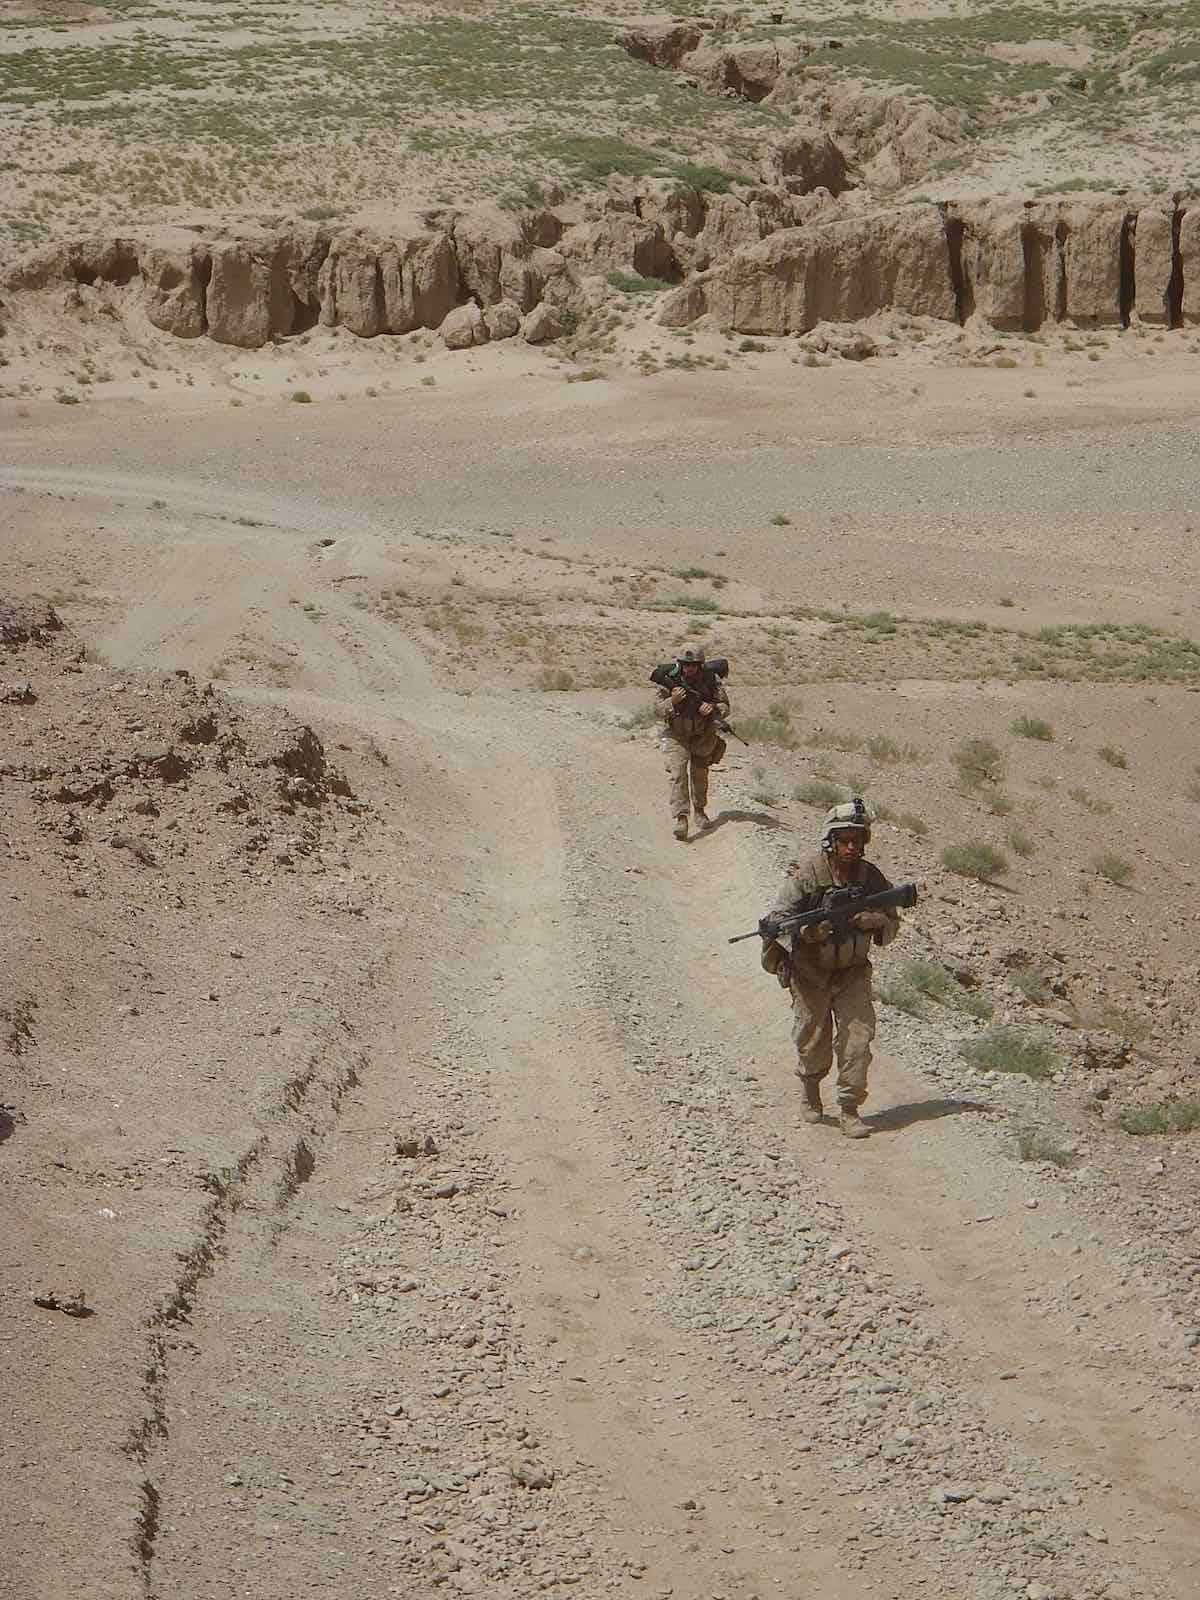 marines marching in Afghanistan